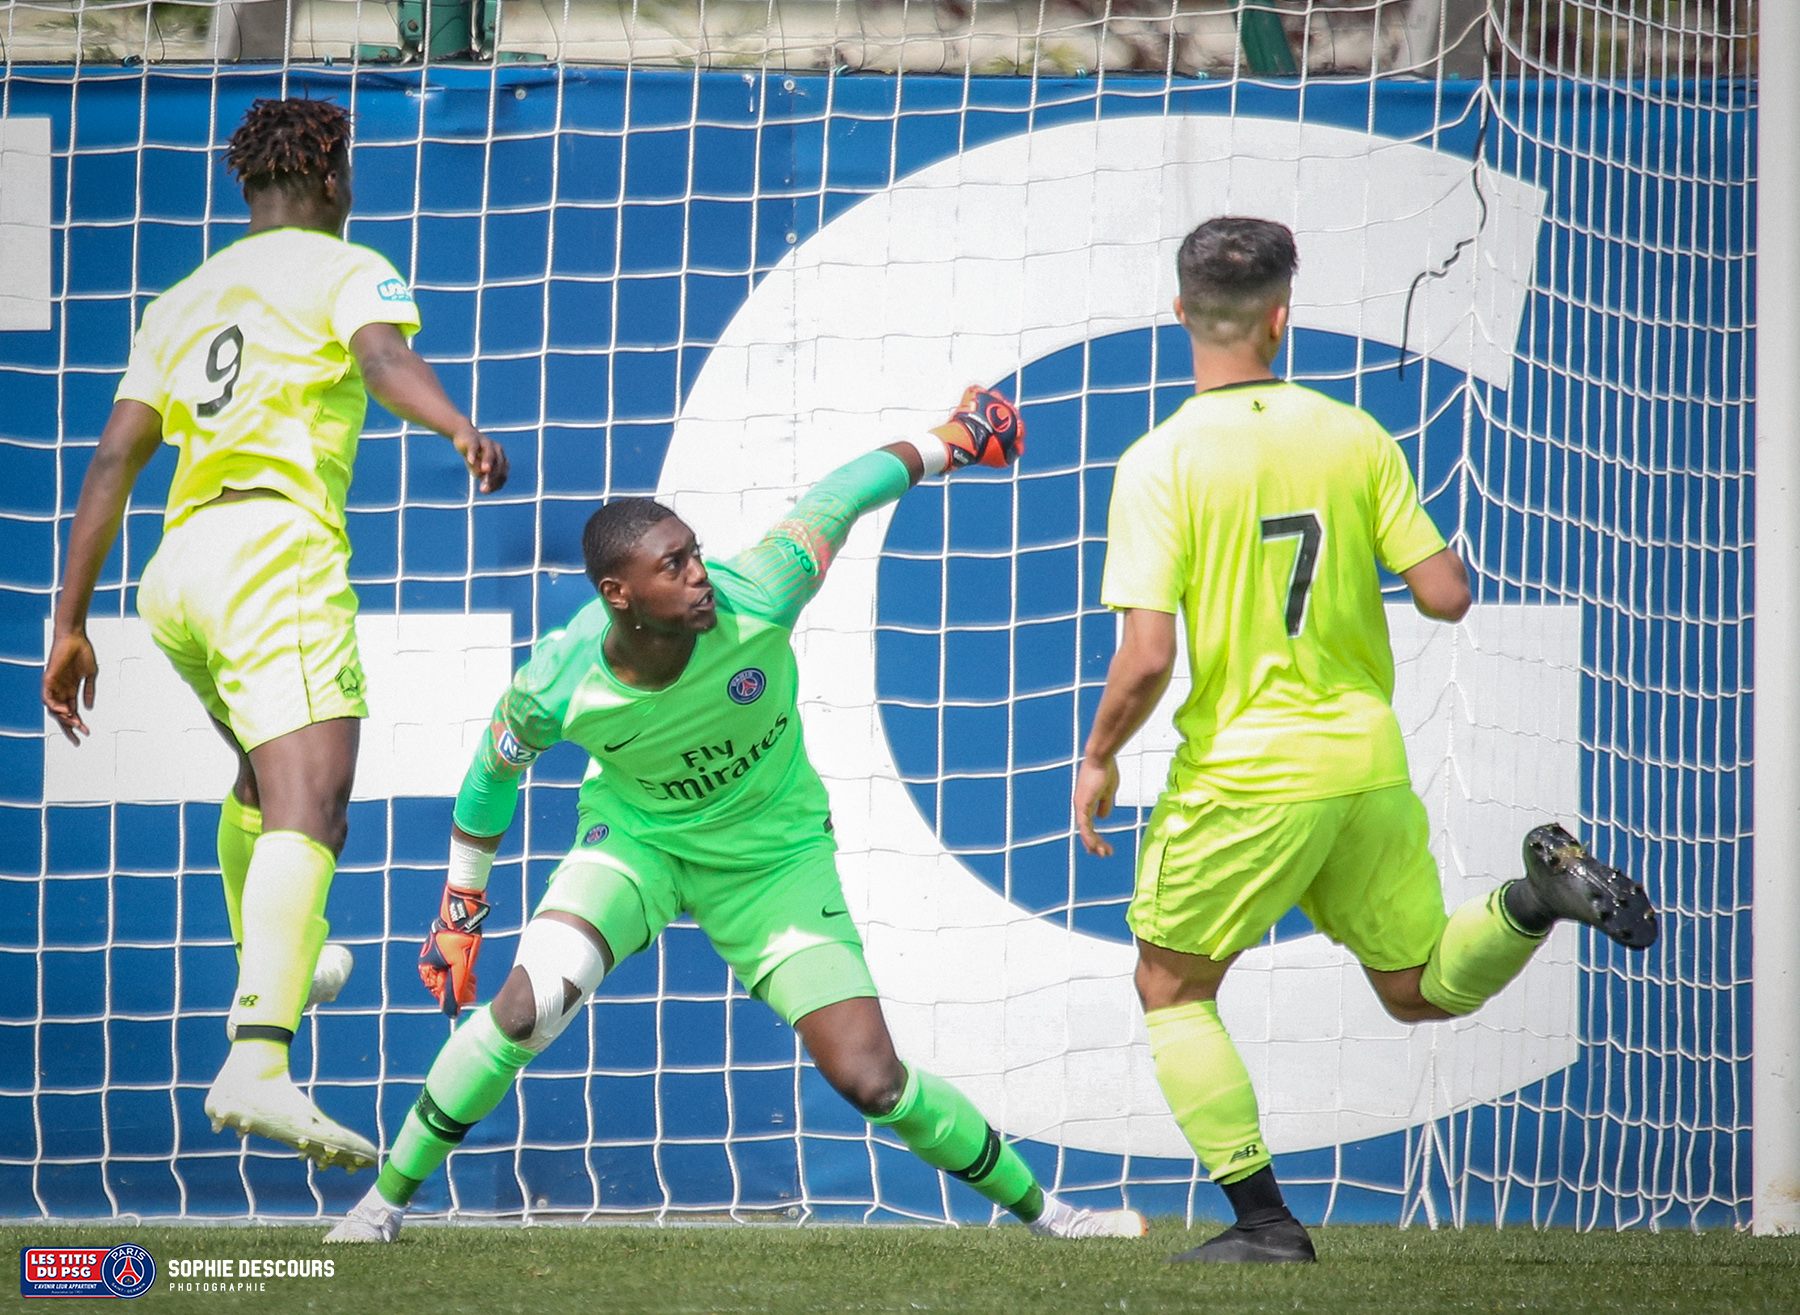 Garrissone Innocent gardien U19 pendant le match PSG-LOSC